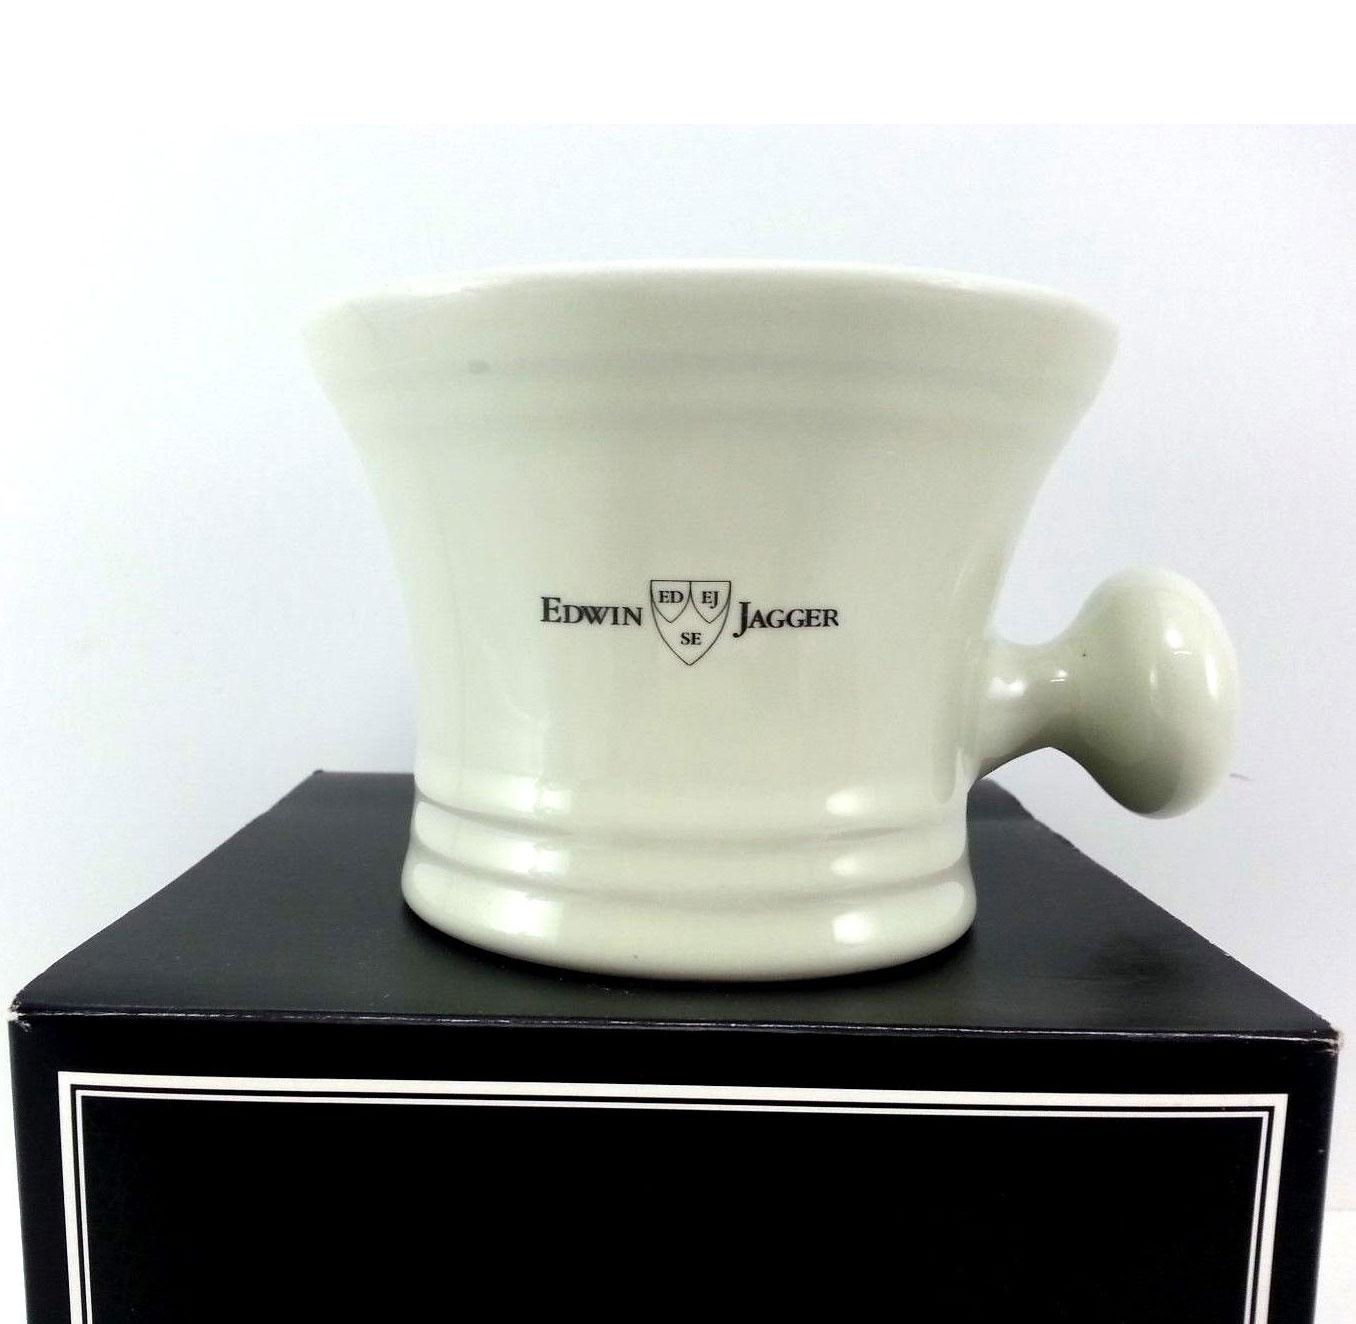 Edwin Jagger Ivory Porcelain Apothecary Shaving Soap Mug